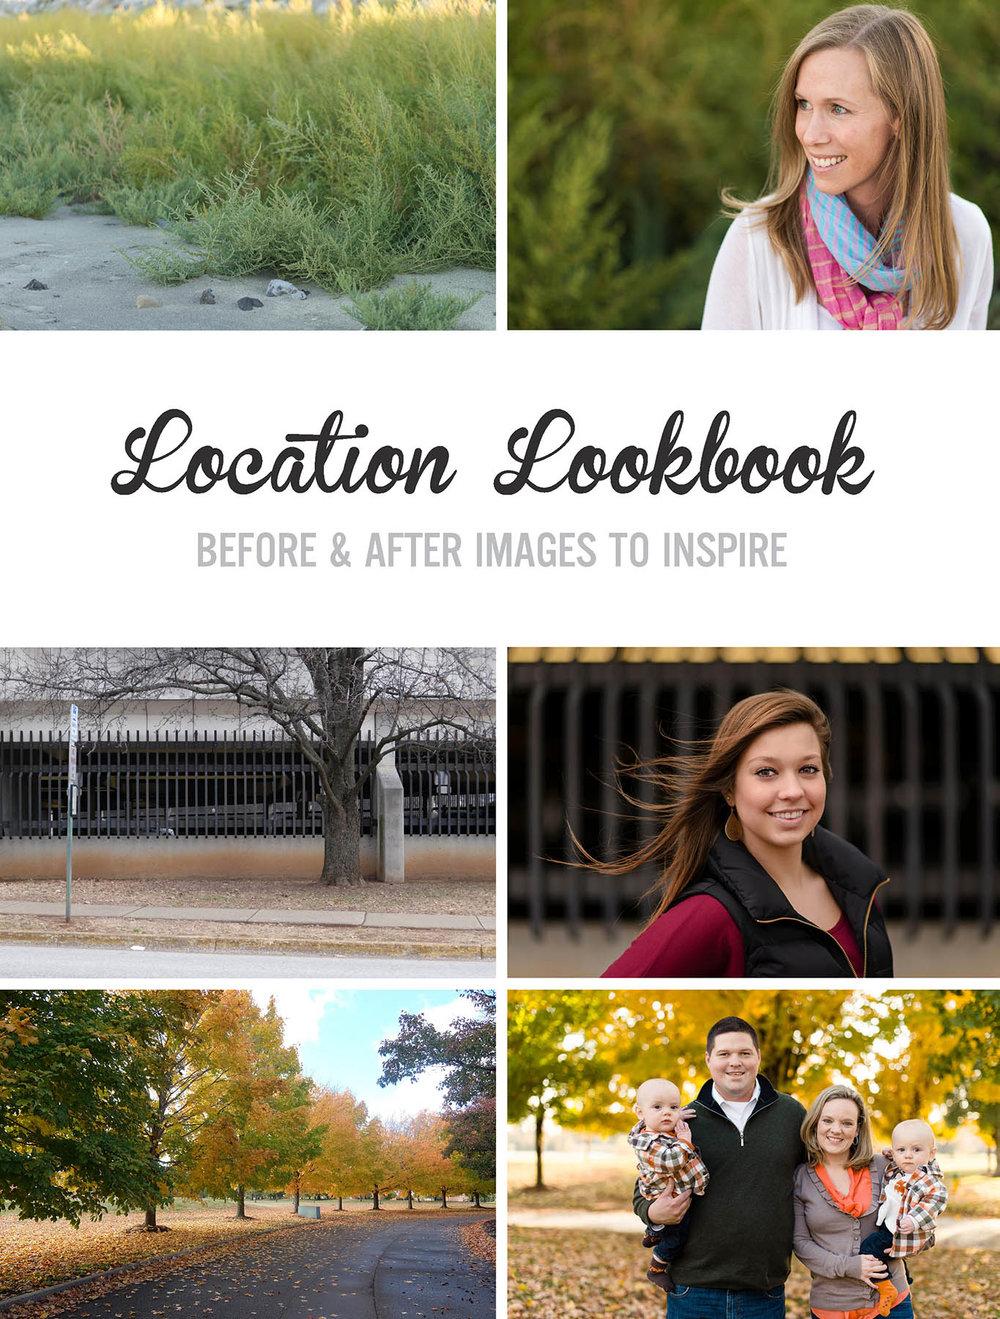 LocationsBreakout-Lookbook_Page_1.jpg